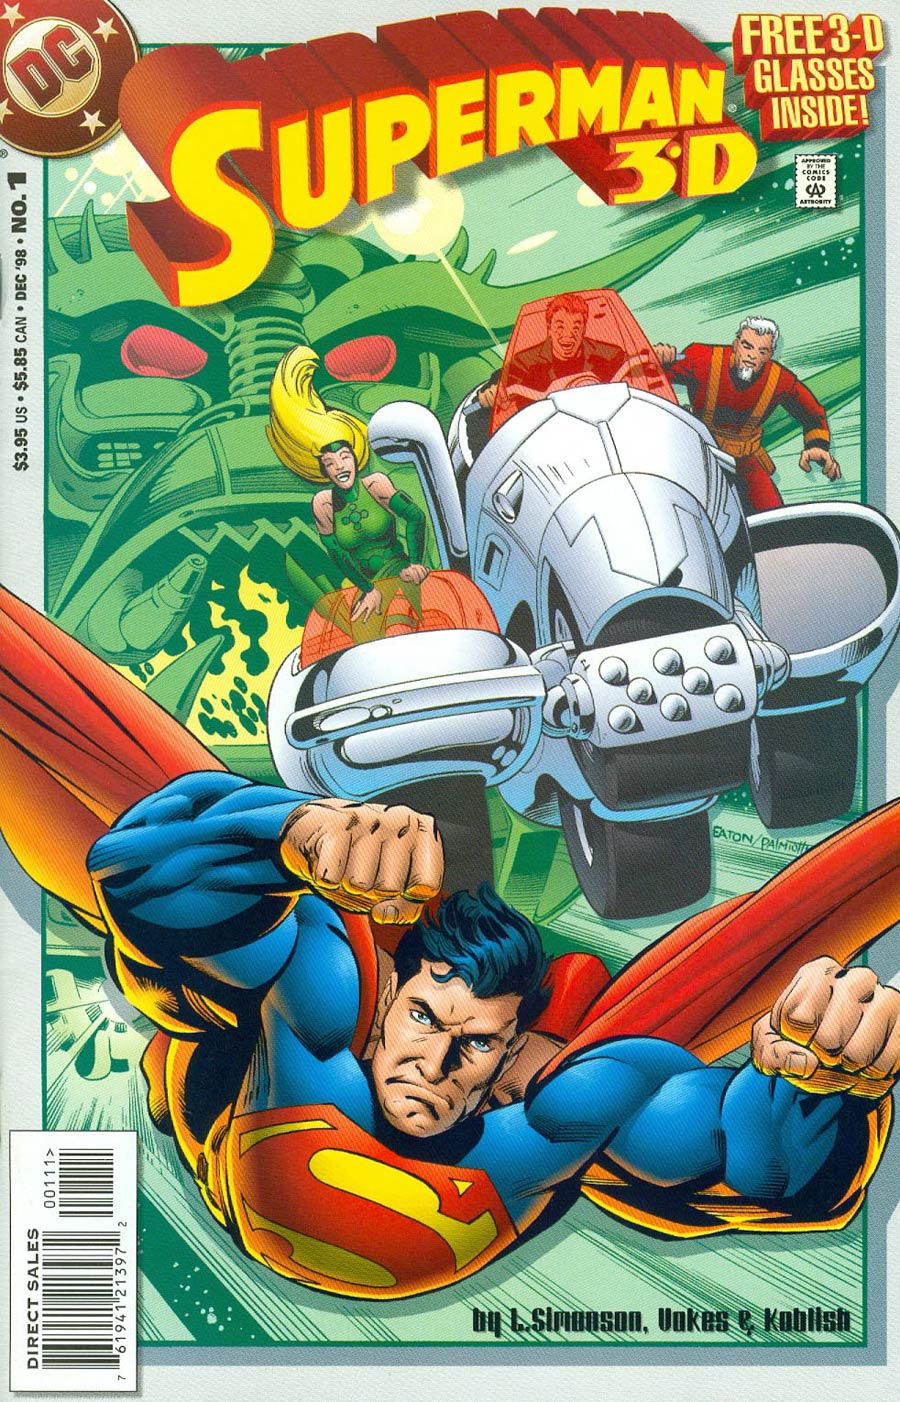 Superman 3-D